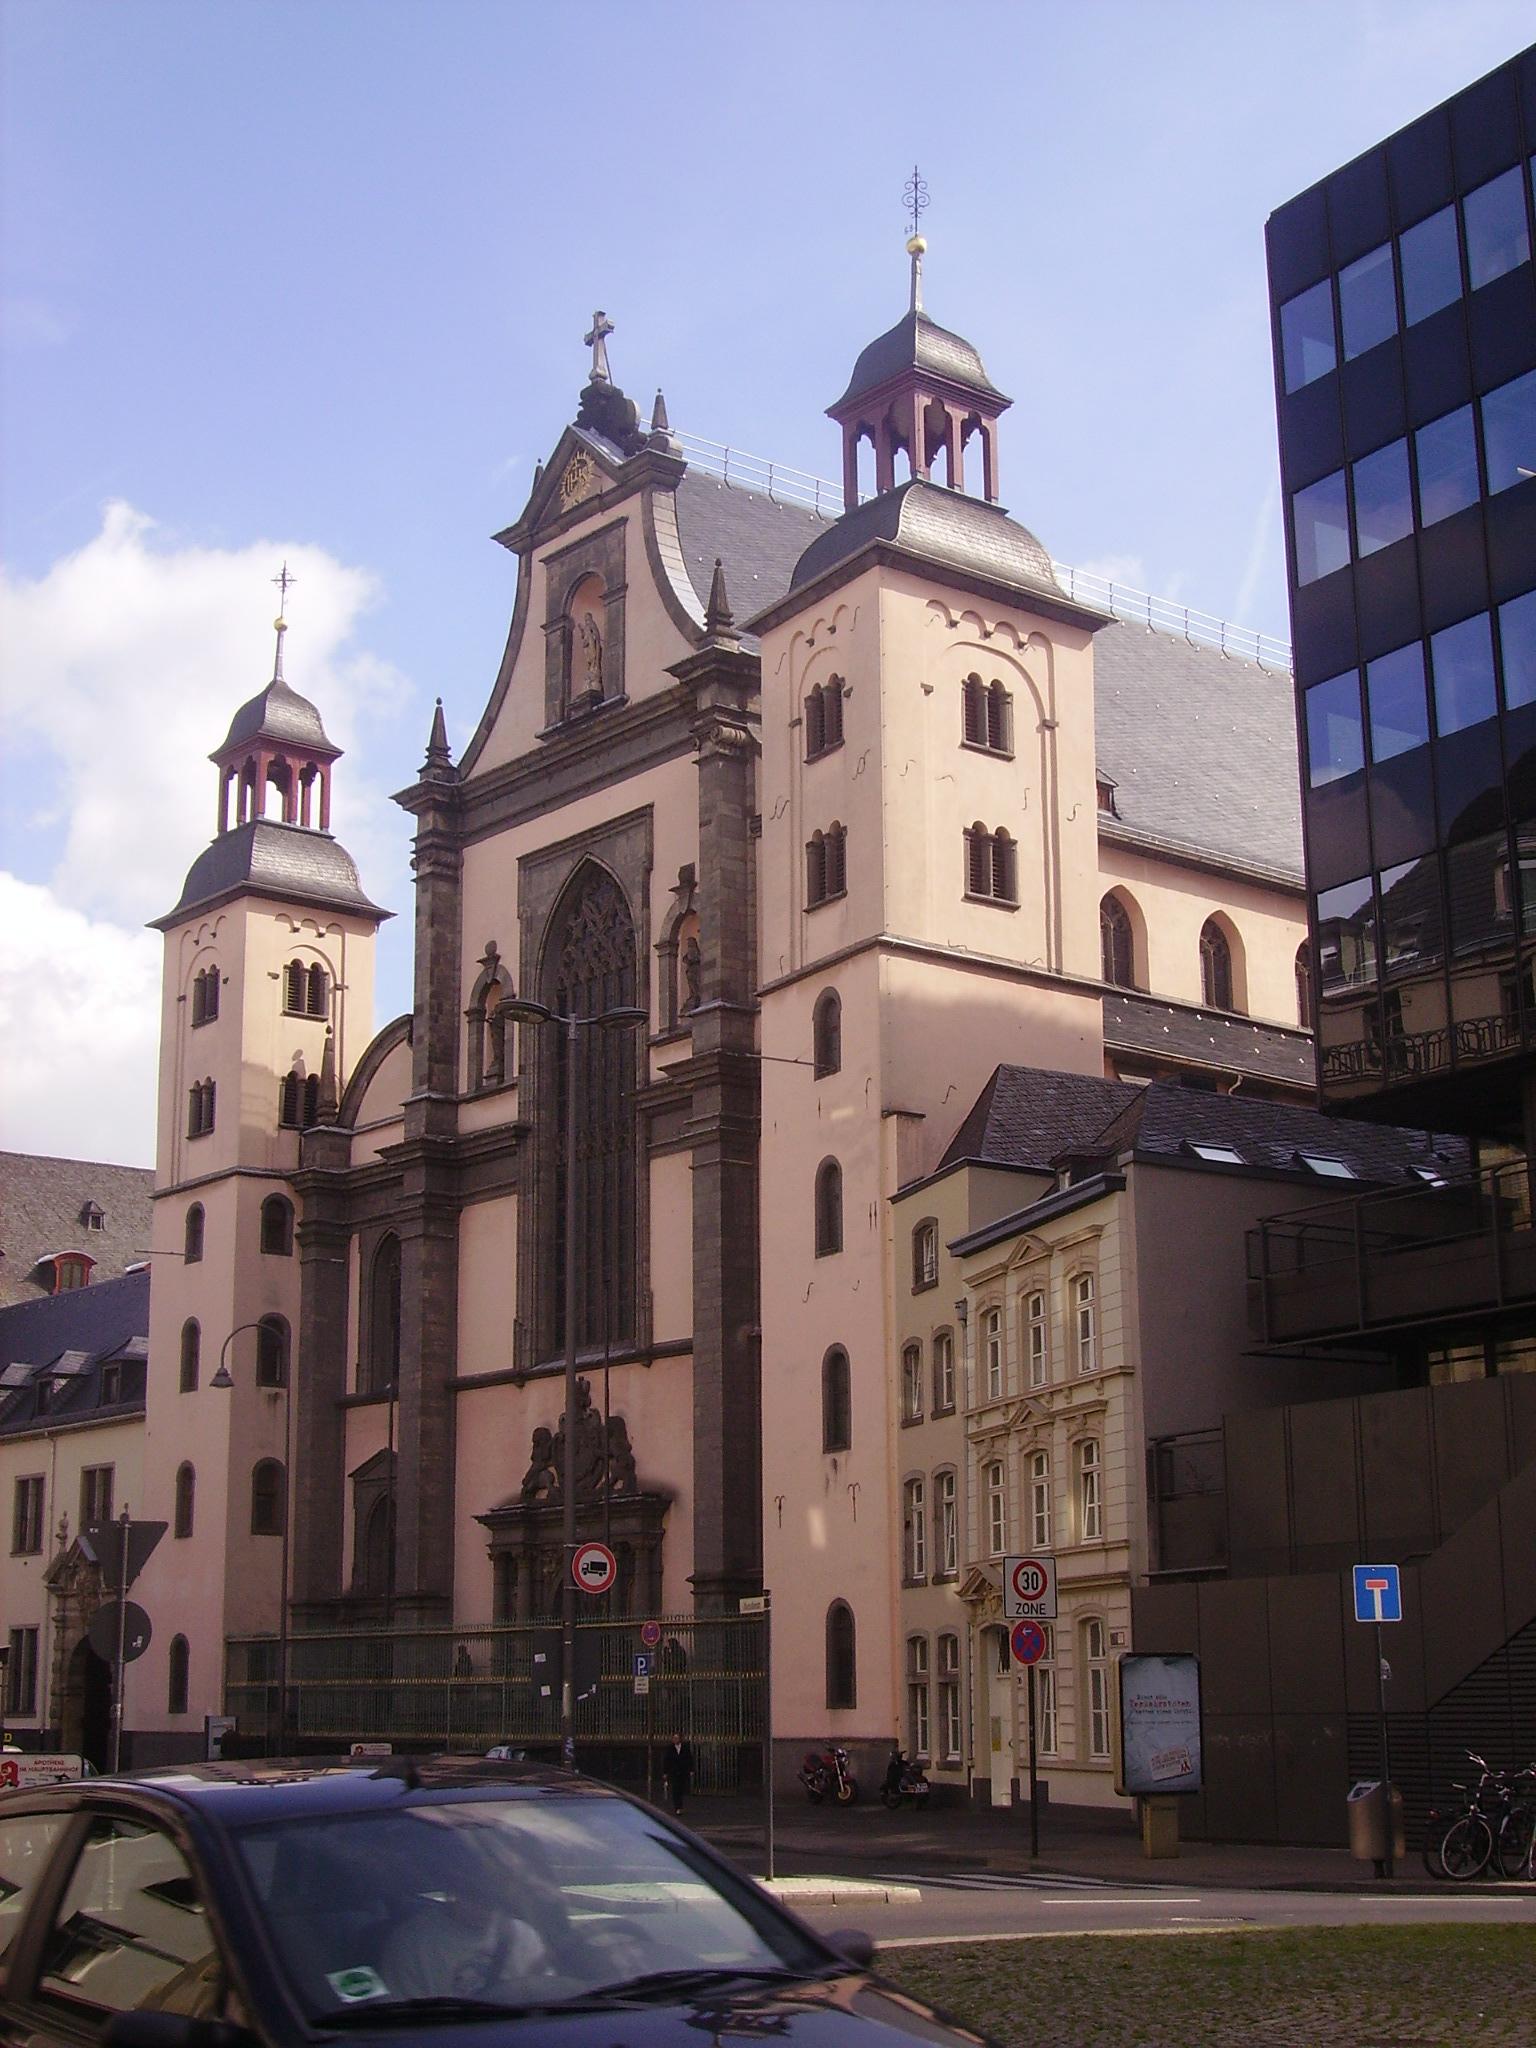 Eingang St. Mariä Himmelfahrt Kirche Marzellenstraße 32, 50668 Köln